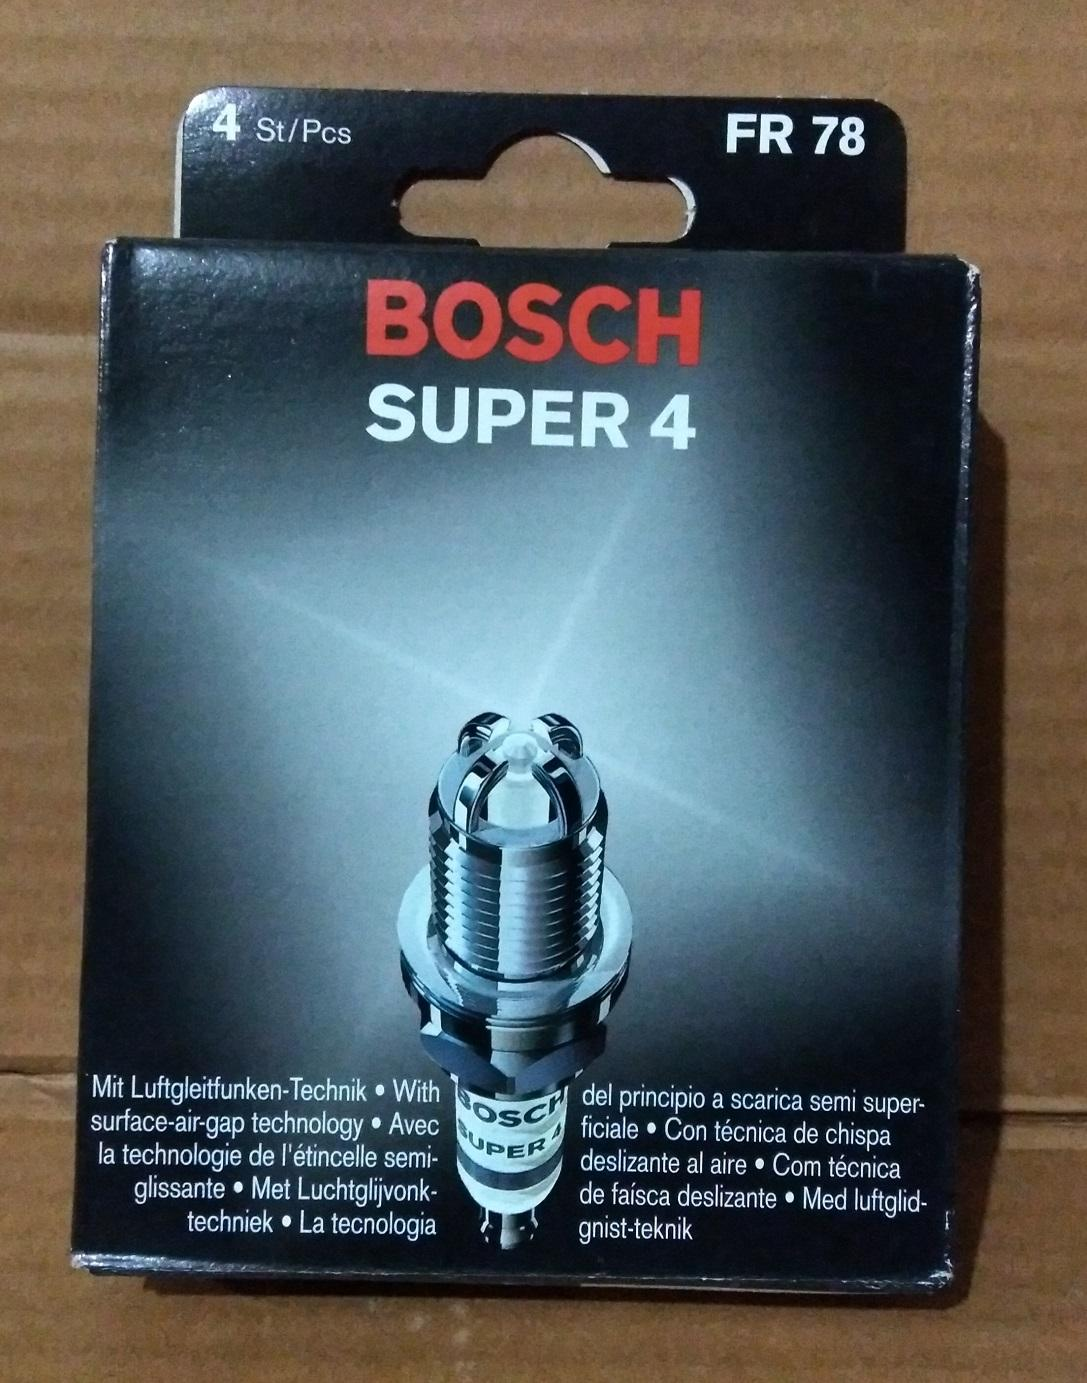 FR78 Super 4 Bosch Spark Plug 4 Tips